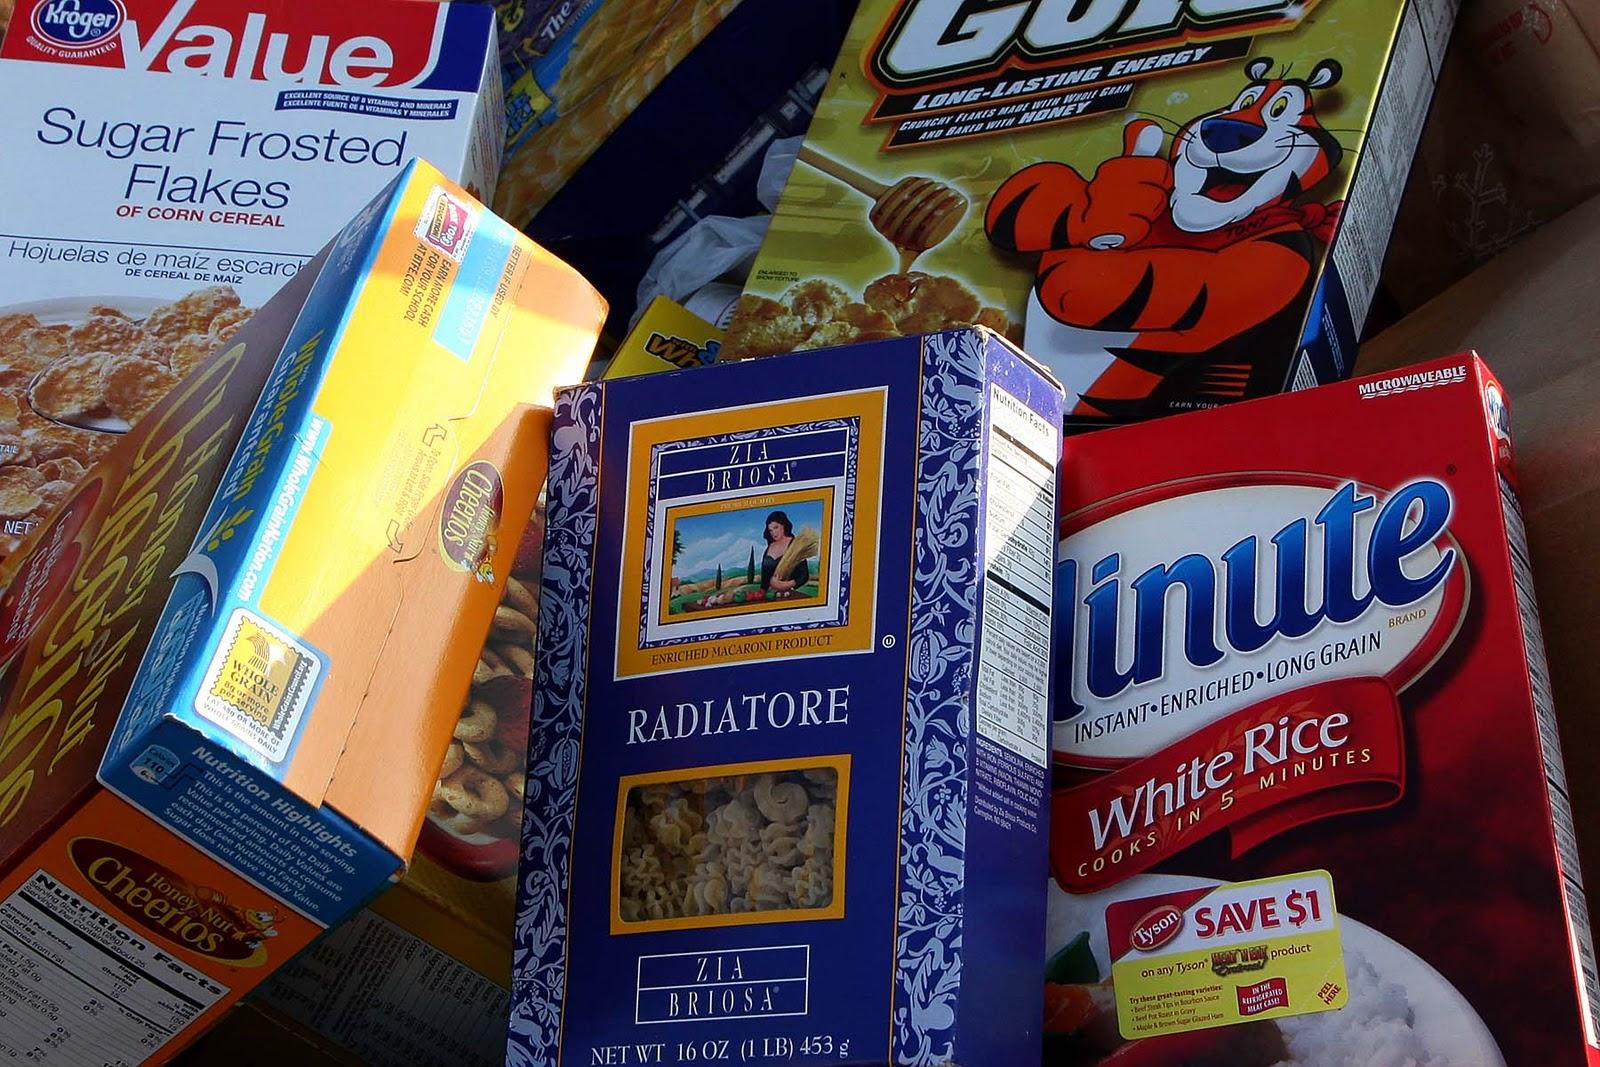 Hunger 101 Az Tempe Az Residents Food Resources Listing